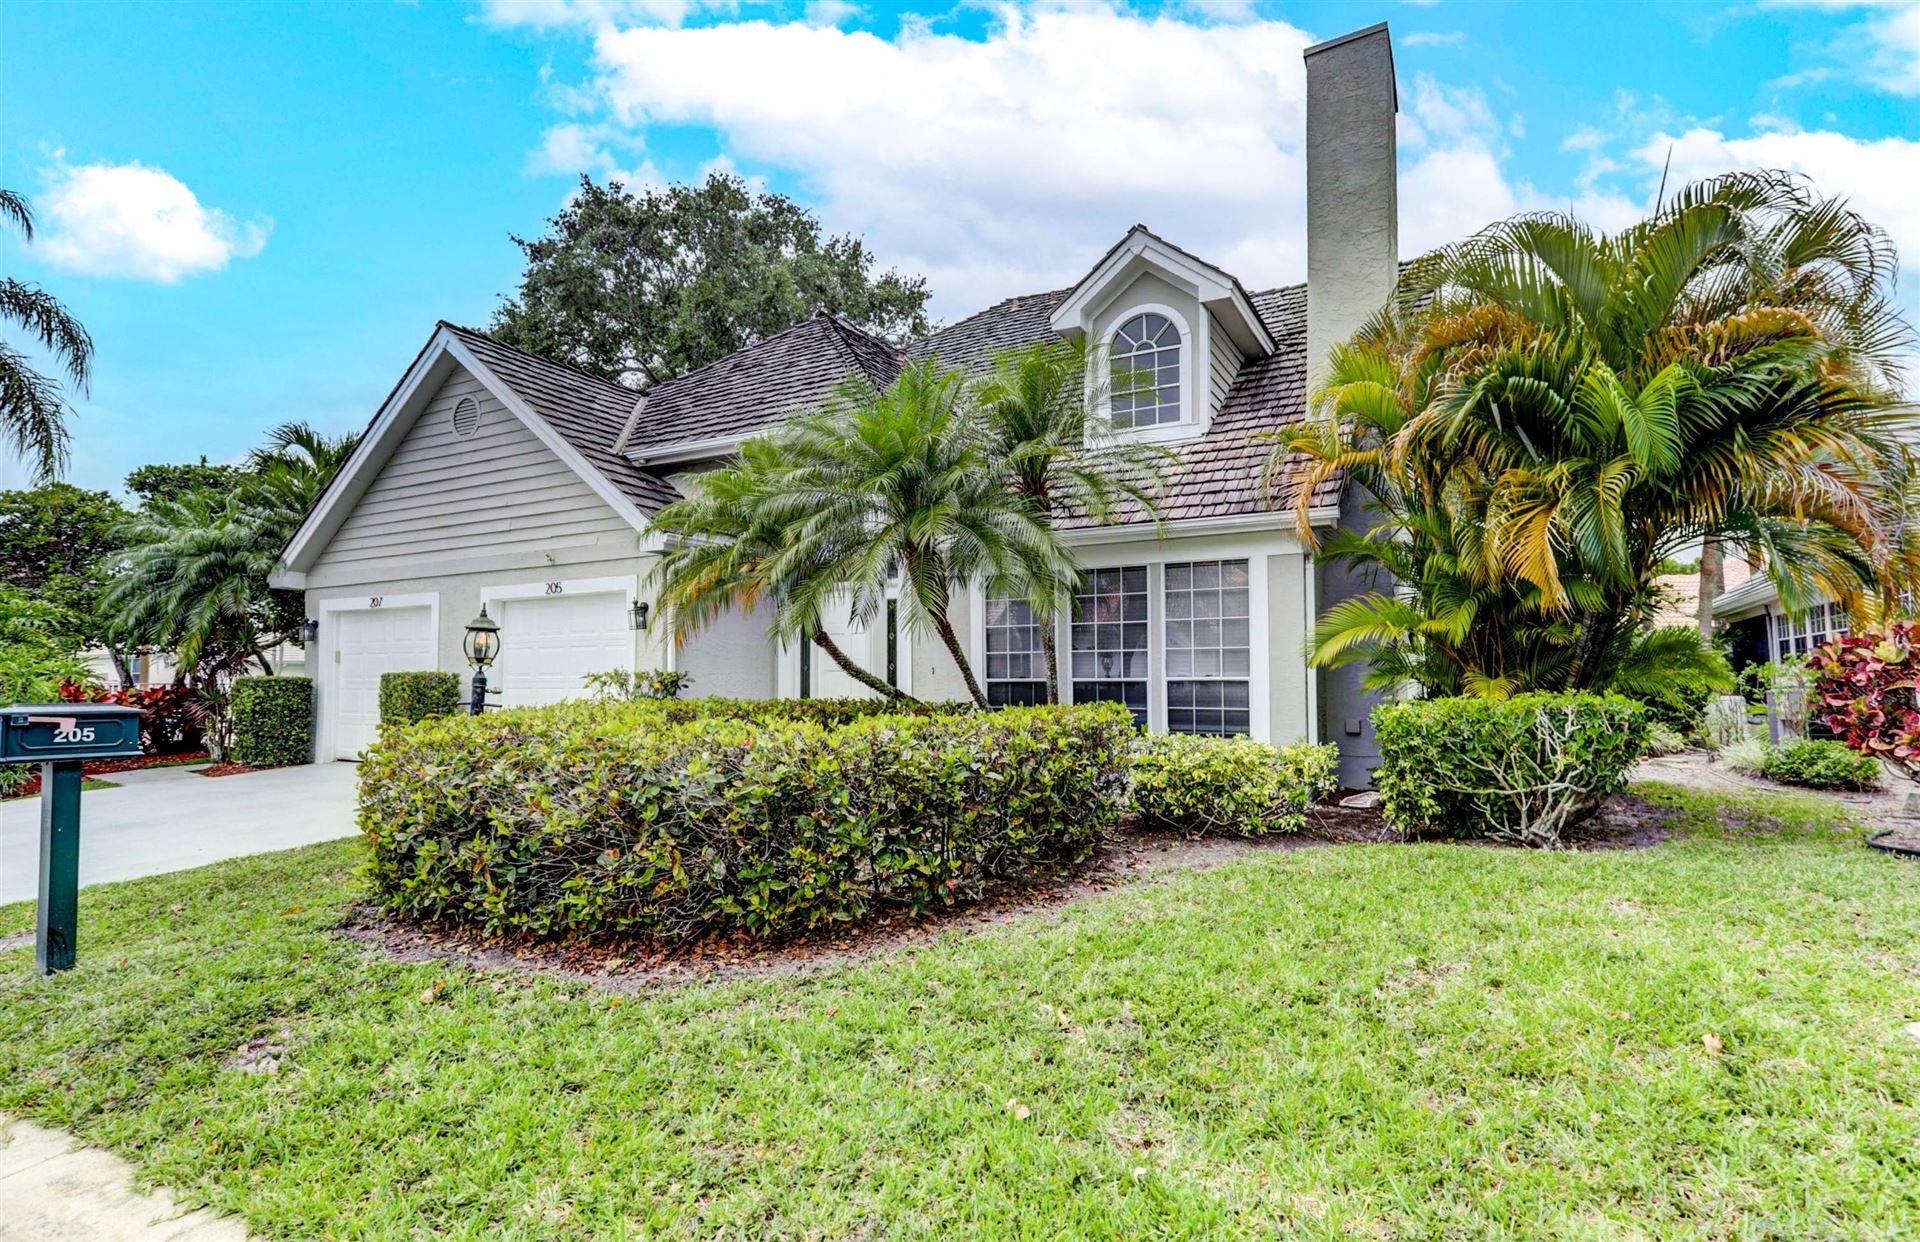 205 Woodsmuir Court, Palm Beach Gardens, FL 33418 - MLS#: RX-10710383